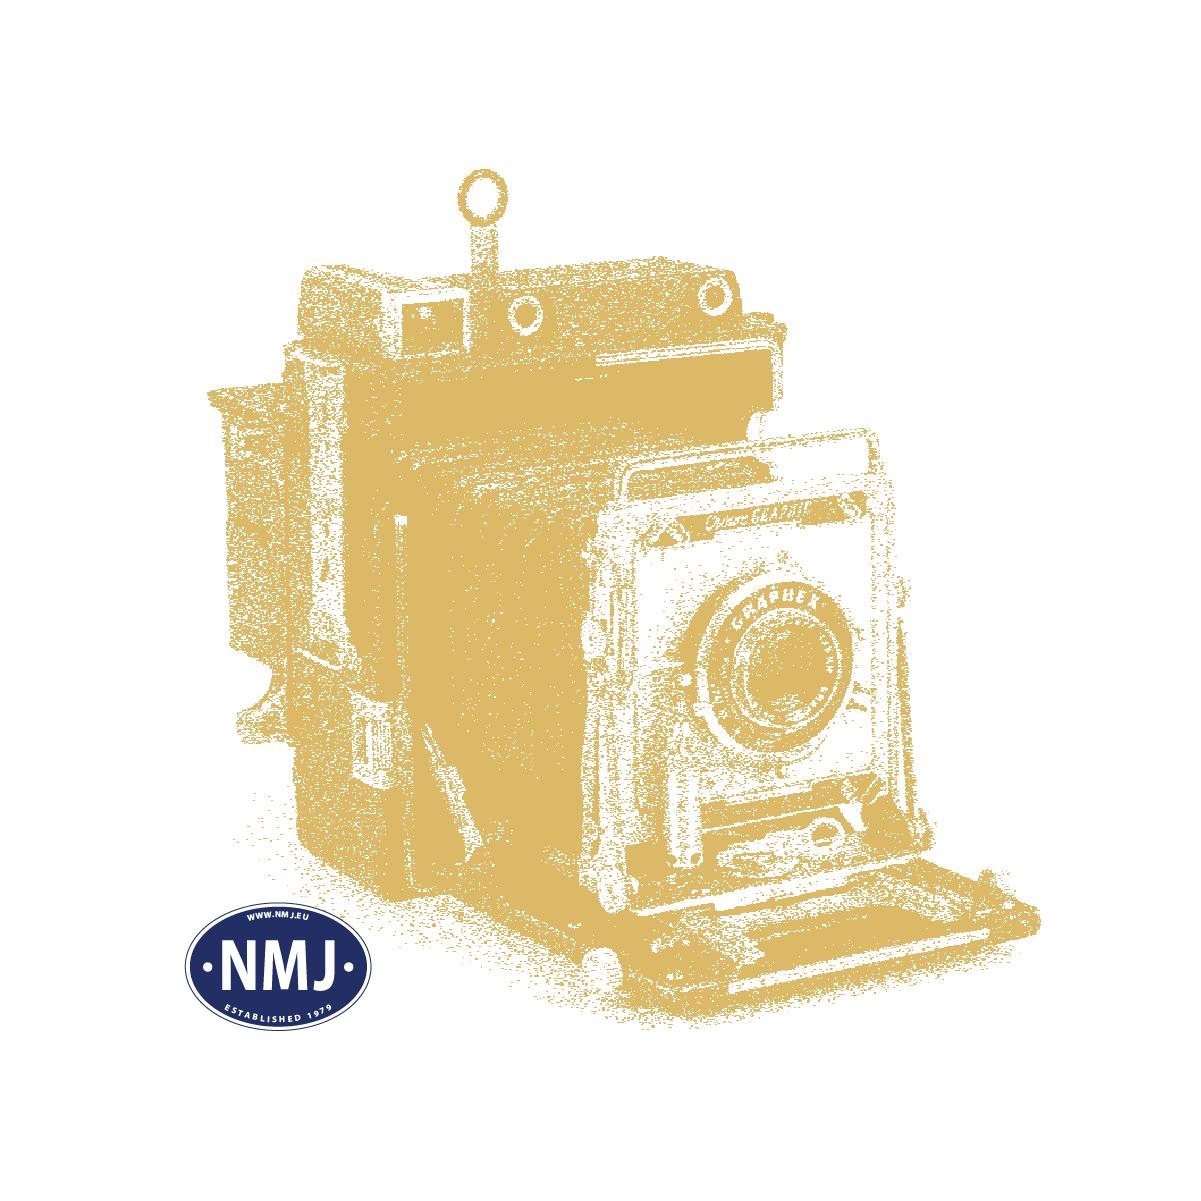 NMJT82.302 - NMJ Topline NSB El13.2123, DC, rot/schwarz